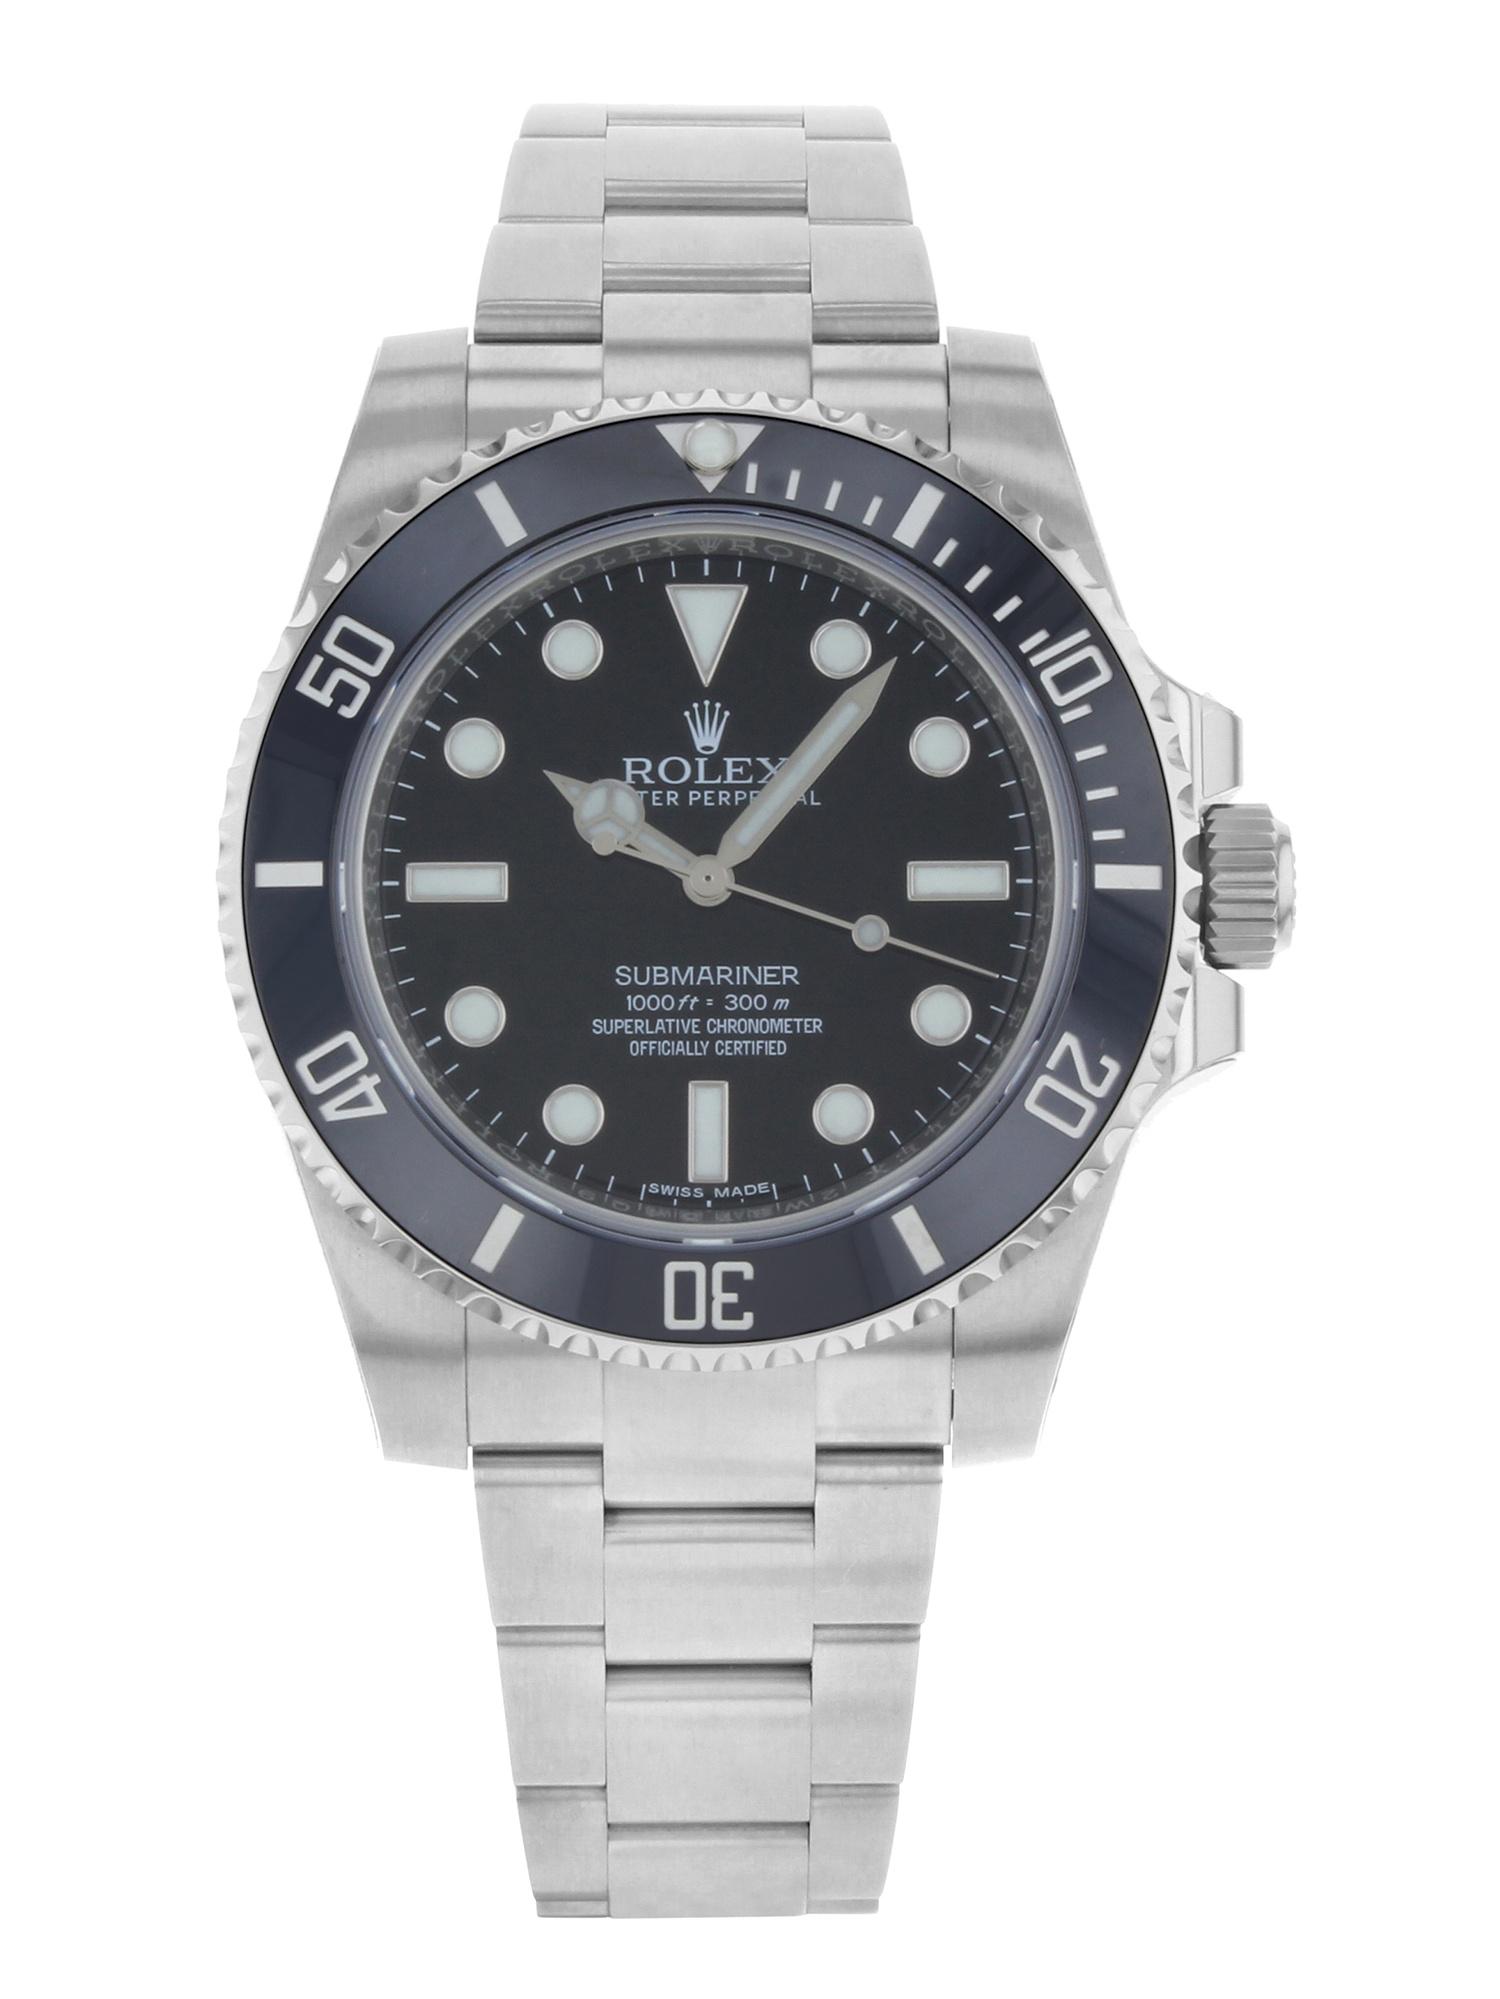 Rolex Submariner Black on Black No Date Steel Ceramic Automatic Men Watch 114060